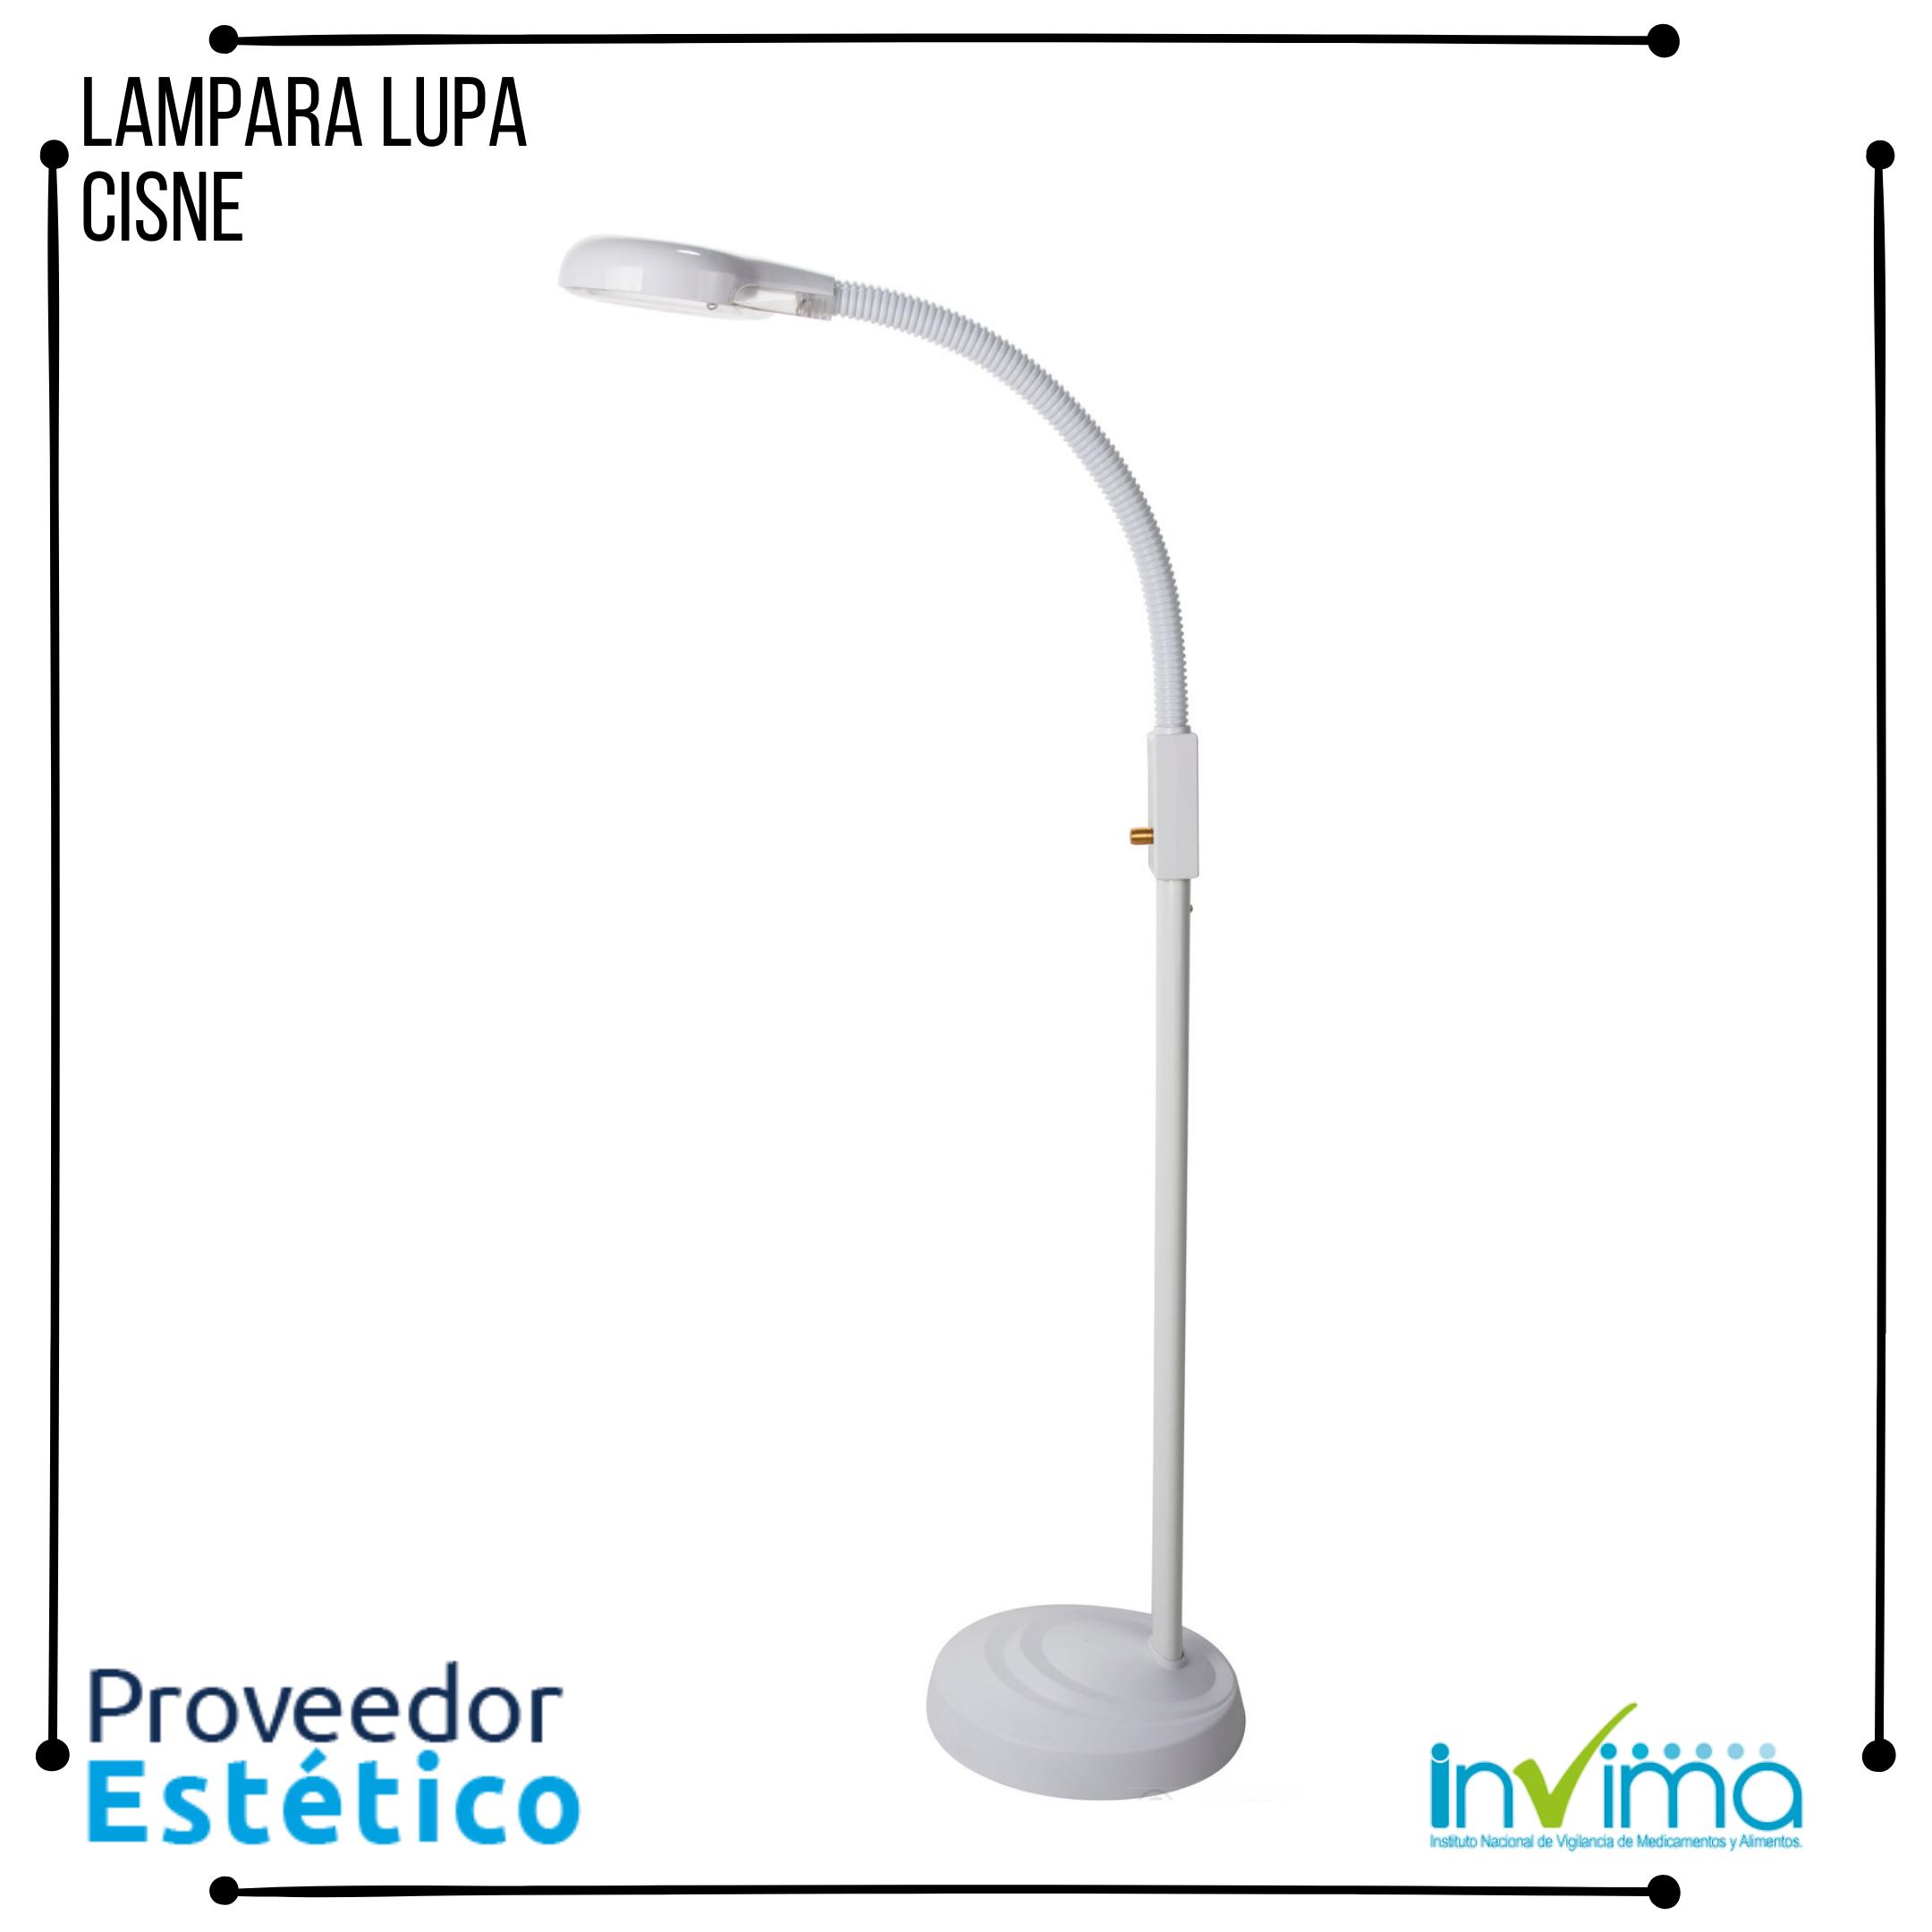 https://0201.nccdn.net/1_2/000/000/0ba/2d3/lampara-lupa-led-cisne--1-.png